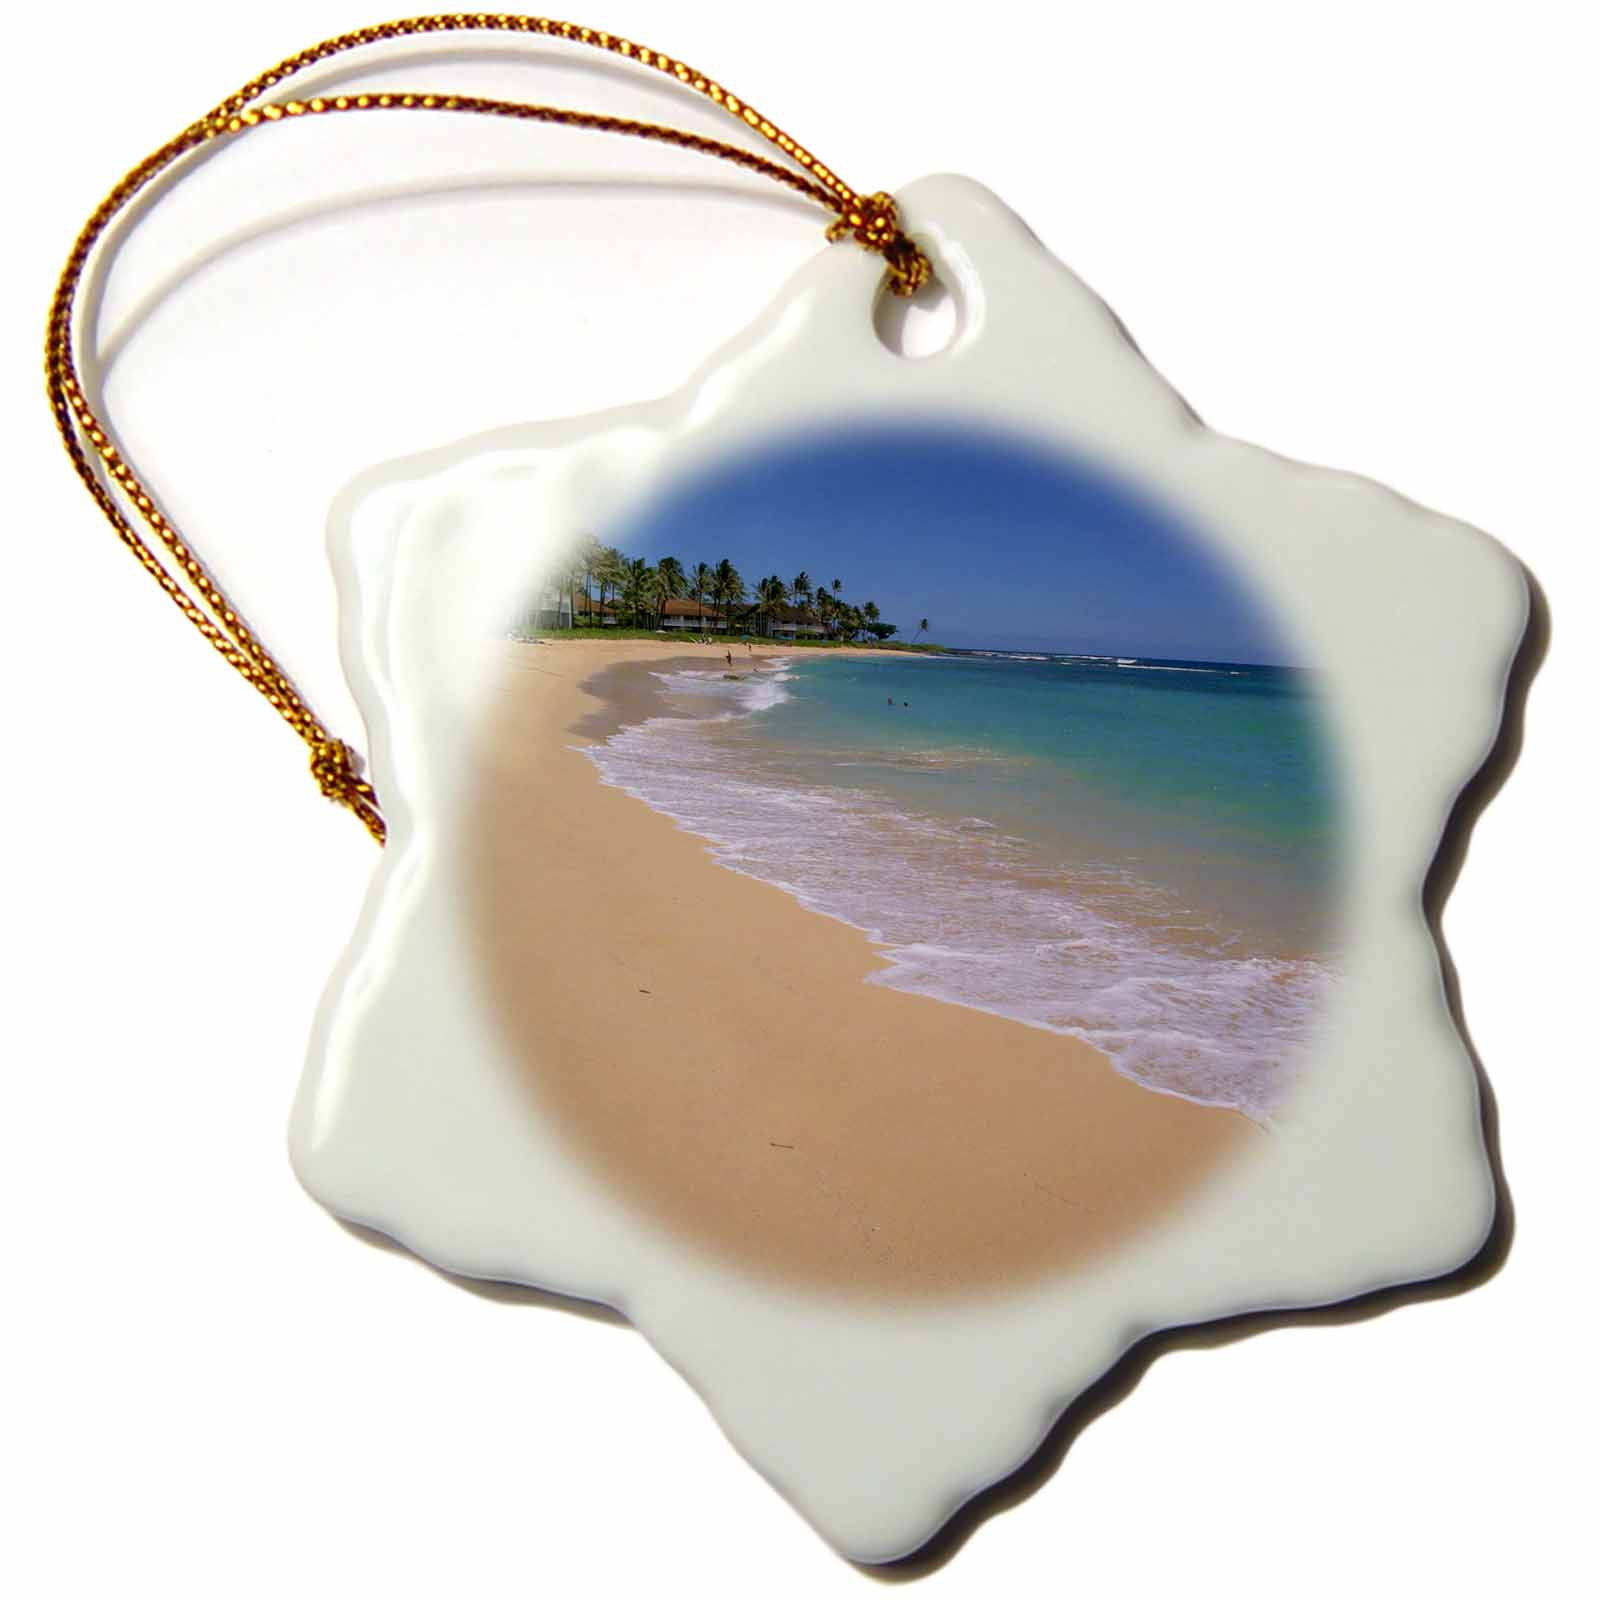 Supplier Generic 3d Rose Poipu Beach, Poipu, Kauai, Hawaii, Usa  -  Us 12 Dpb 1241  -  Douglas Peebles, Snowflake Ornament, Porcelain, 3 - inch